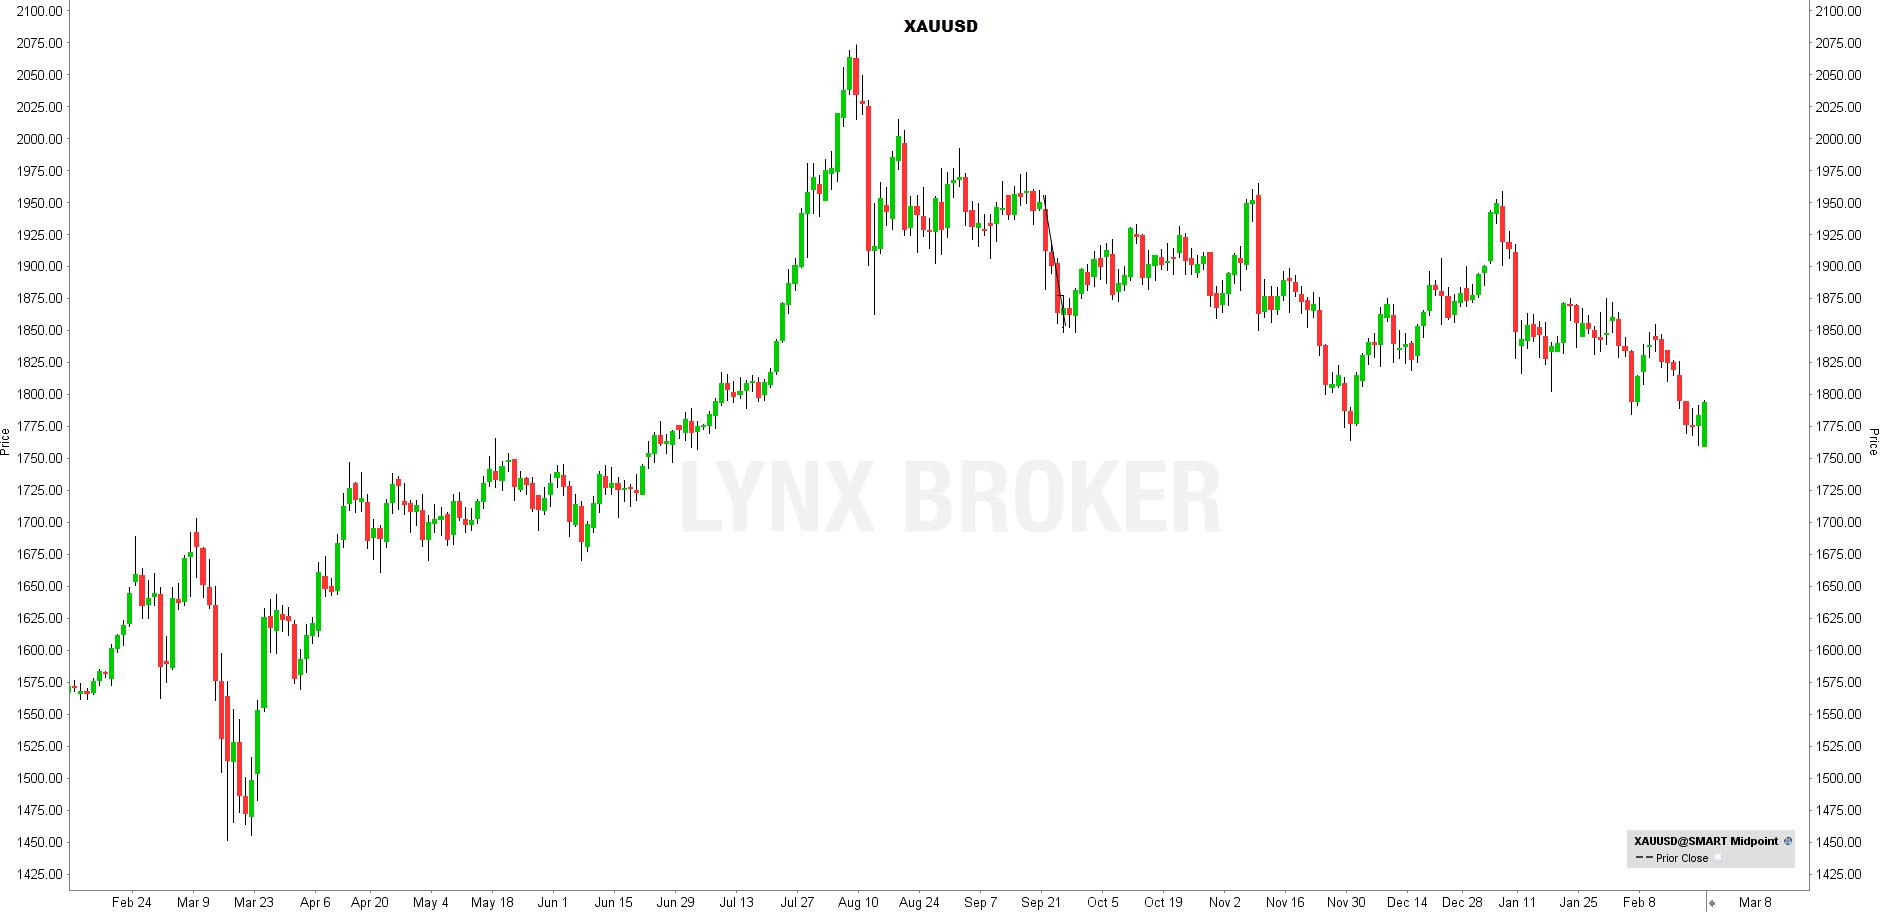 la chronique lynx broker 220221 - graphique XAUUSD